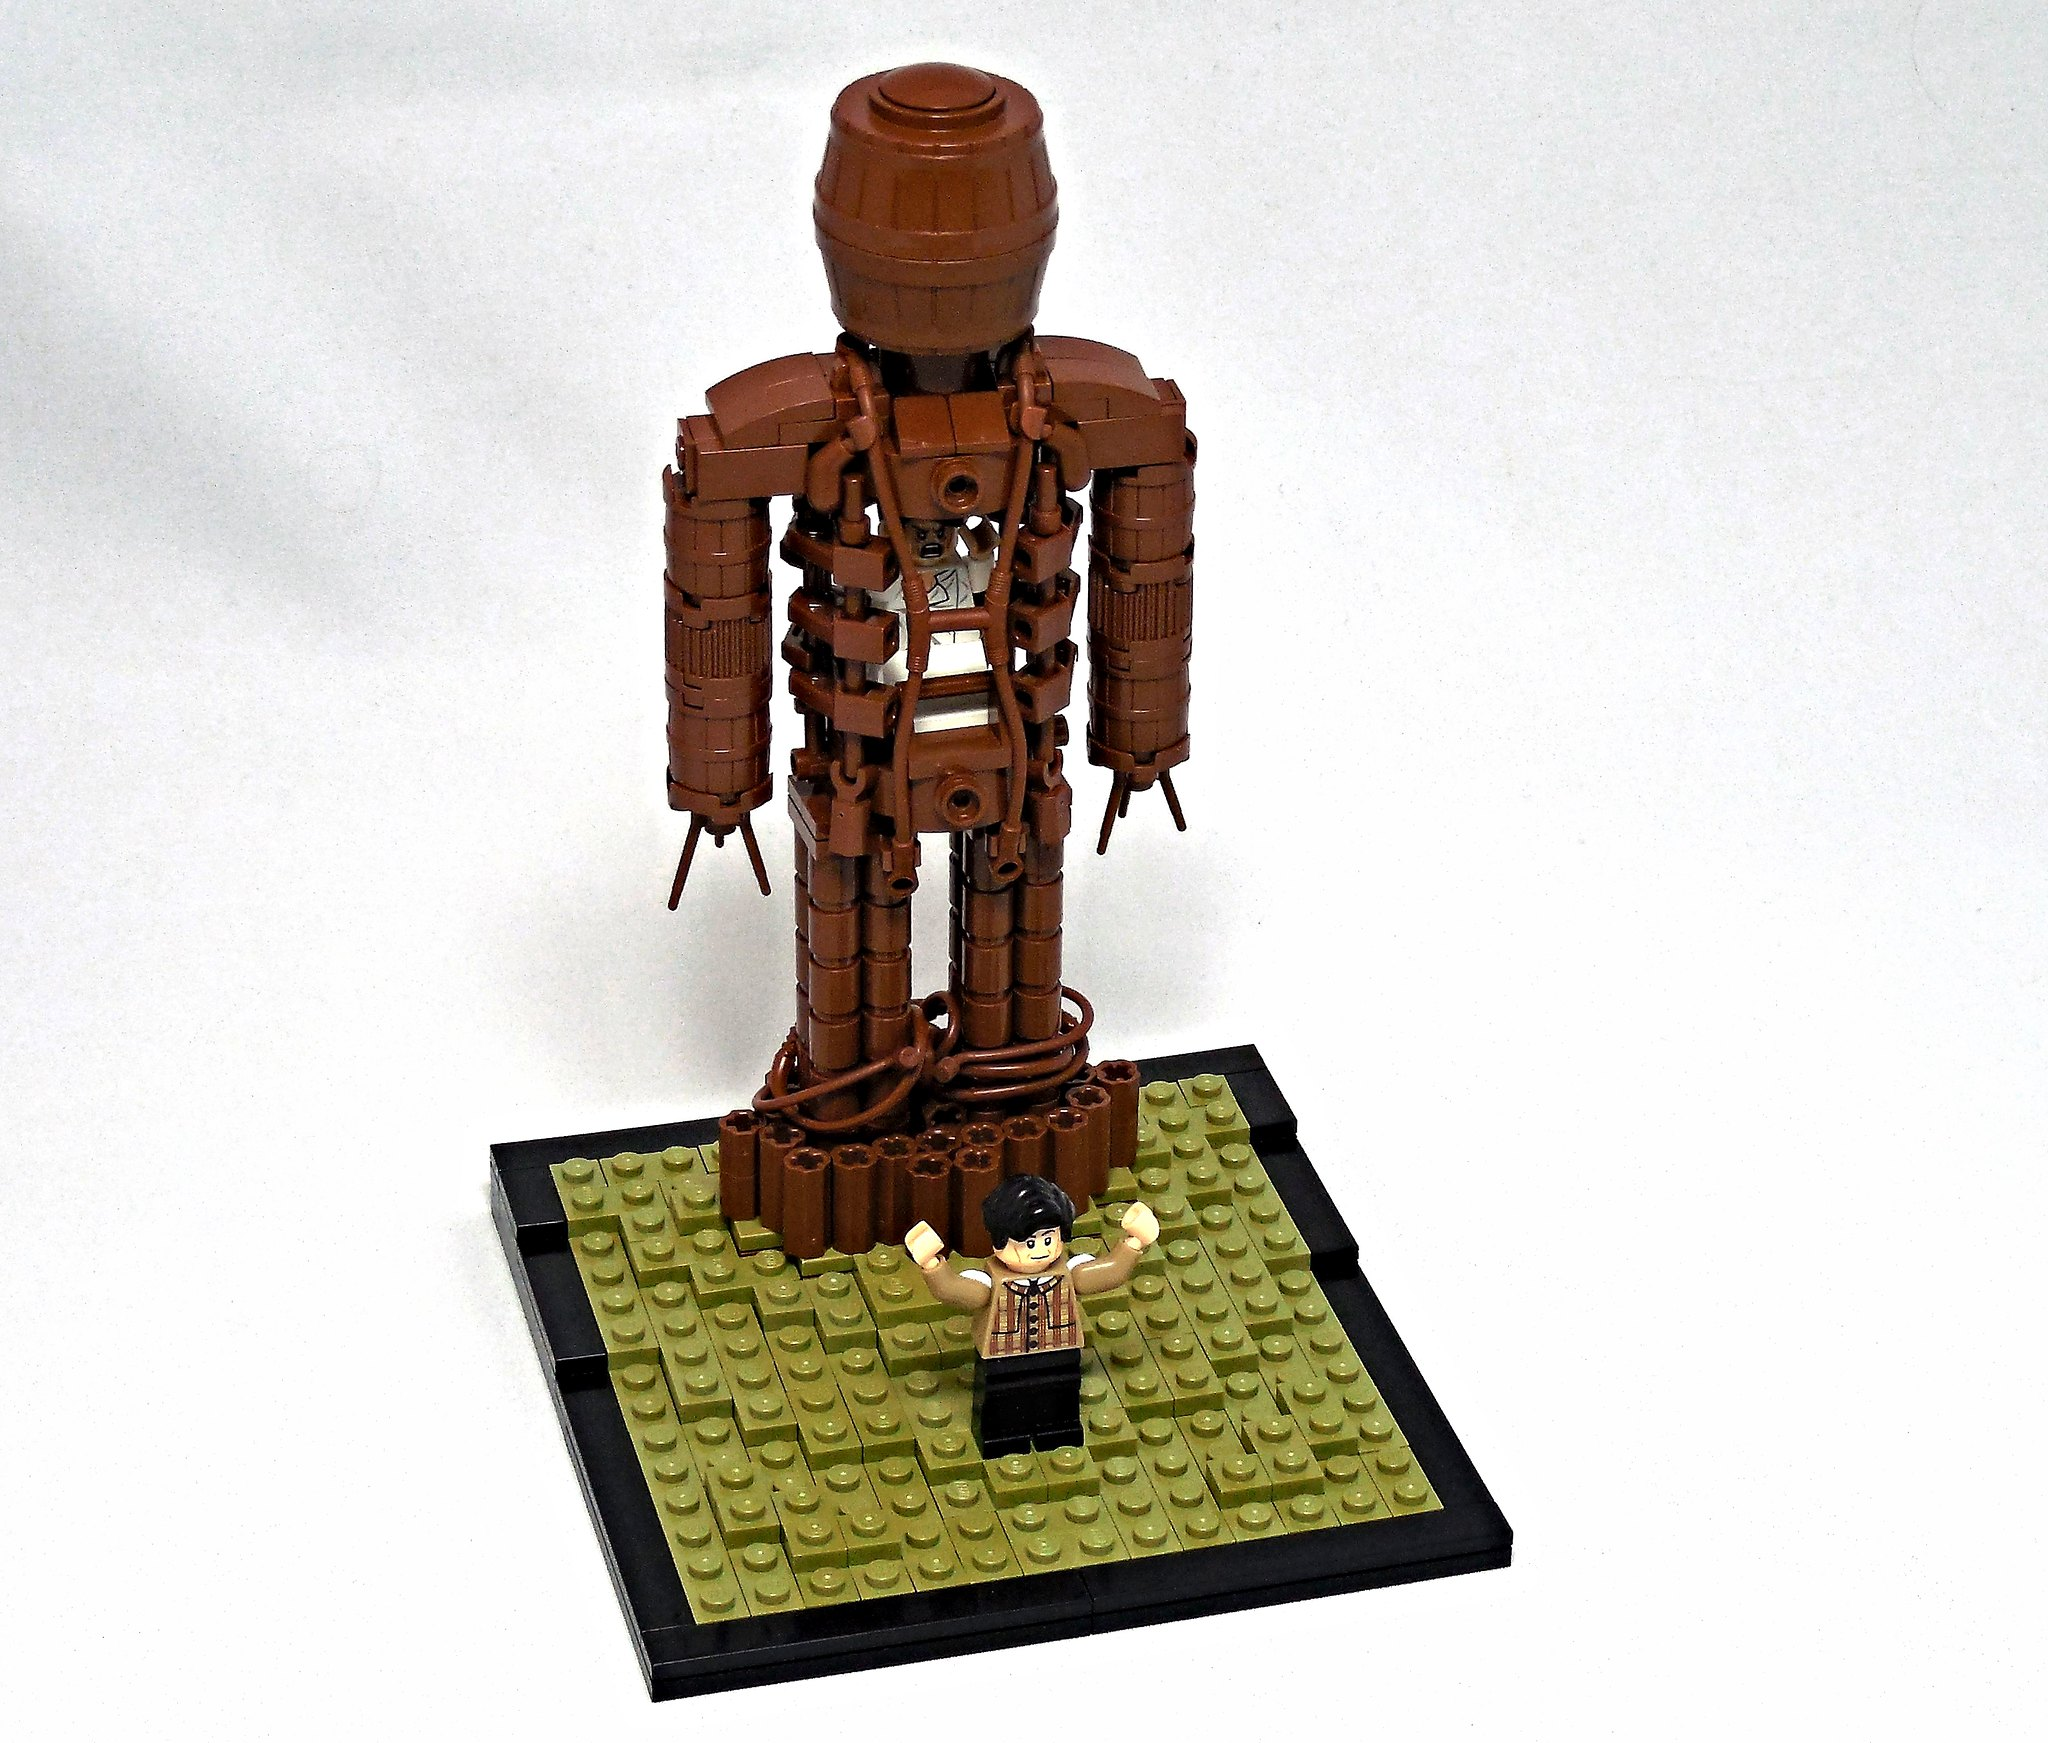 LEGO® MOC by Vitreolum: The Wicker Man